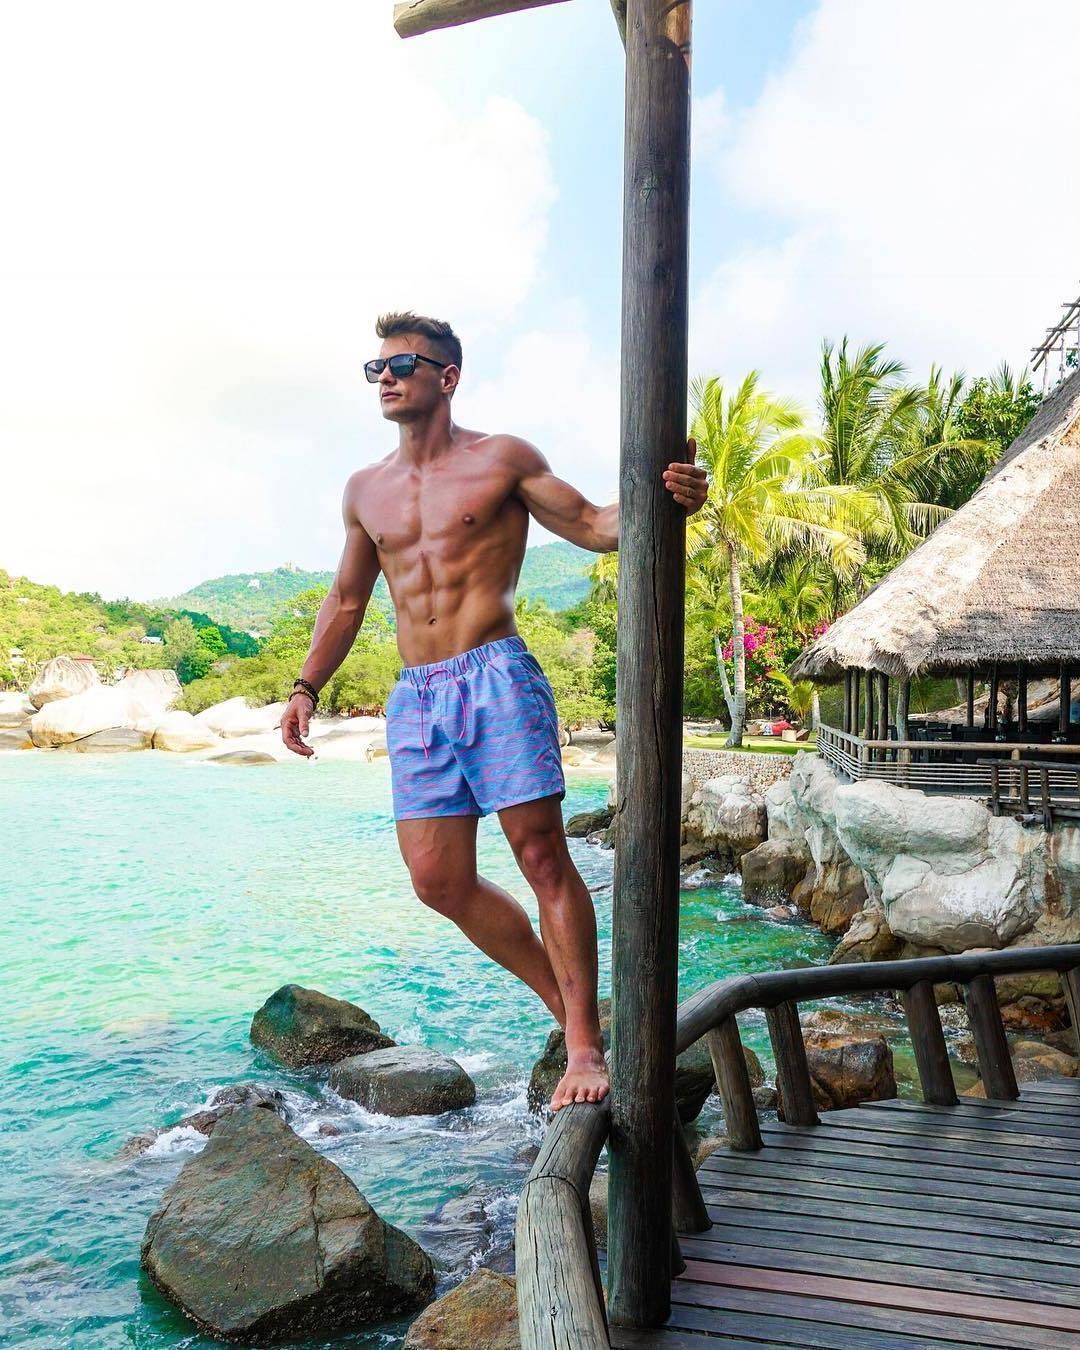 fit-sexy-barechest-guys-sunglasses-fun-summer-vacation-brendan-dooling